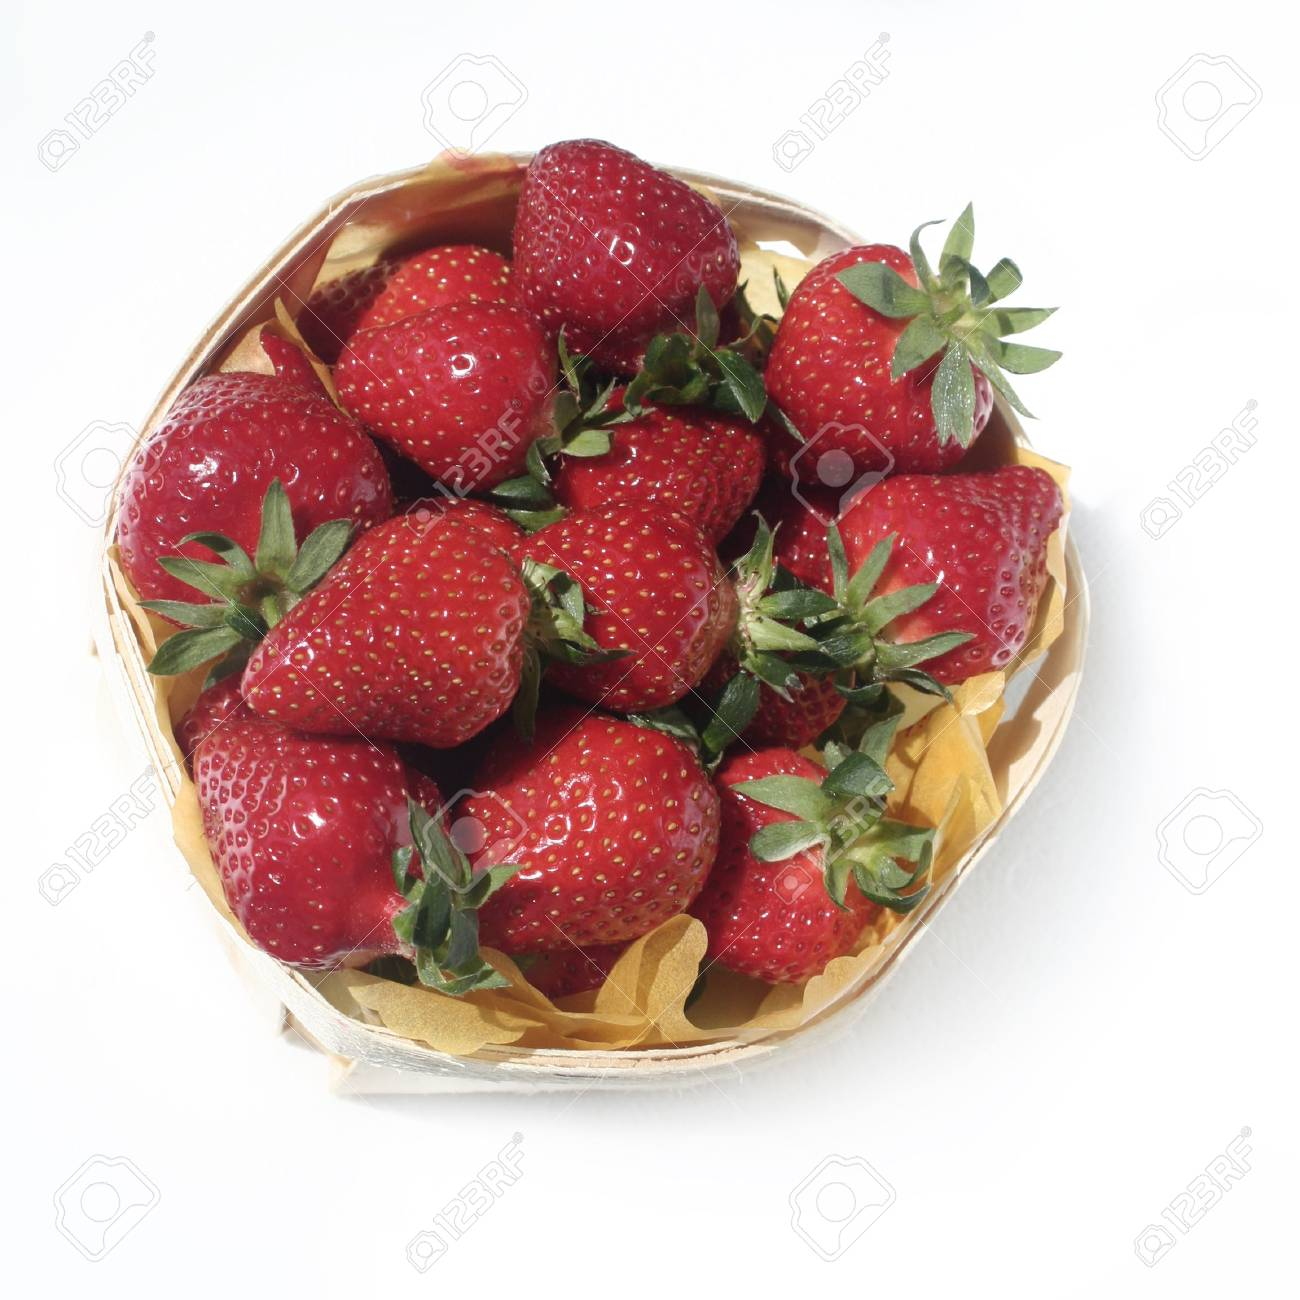 bascket  of strawberries isolated on white Stock Photo - 6817865